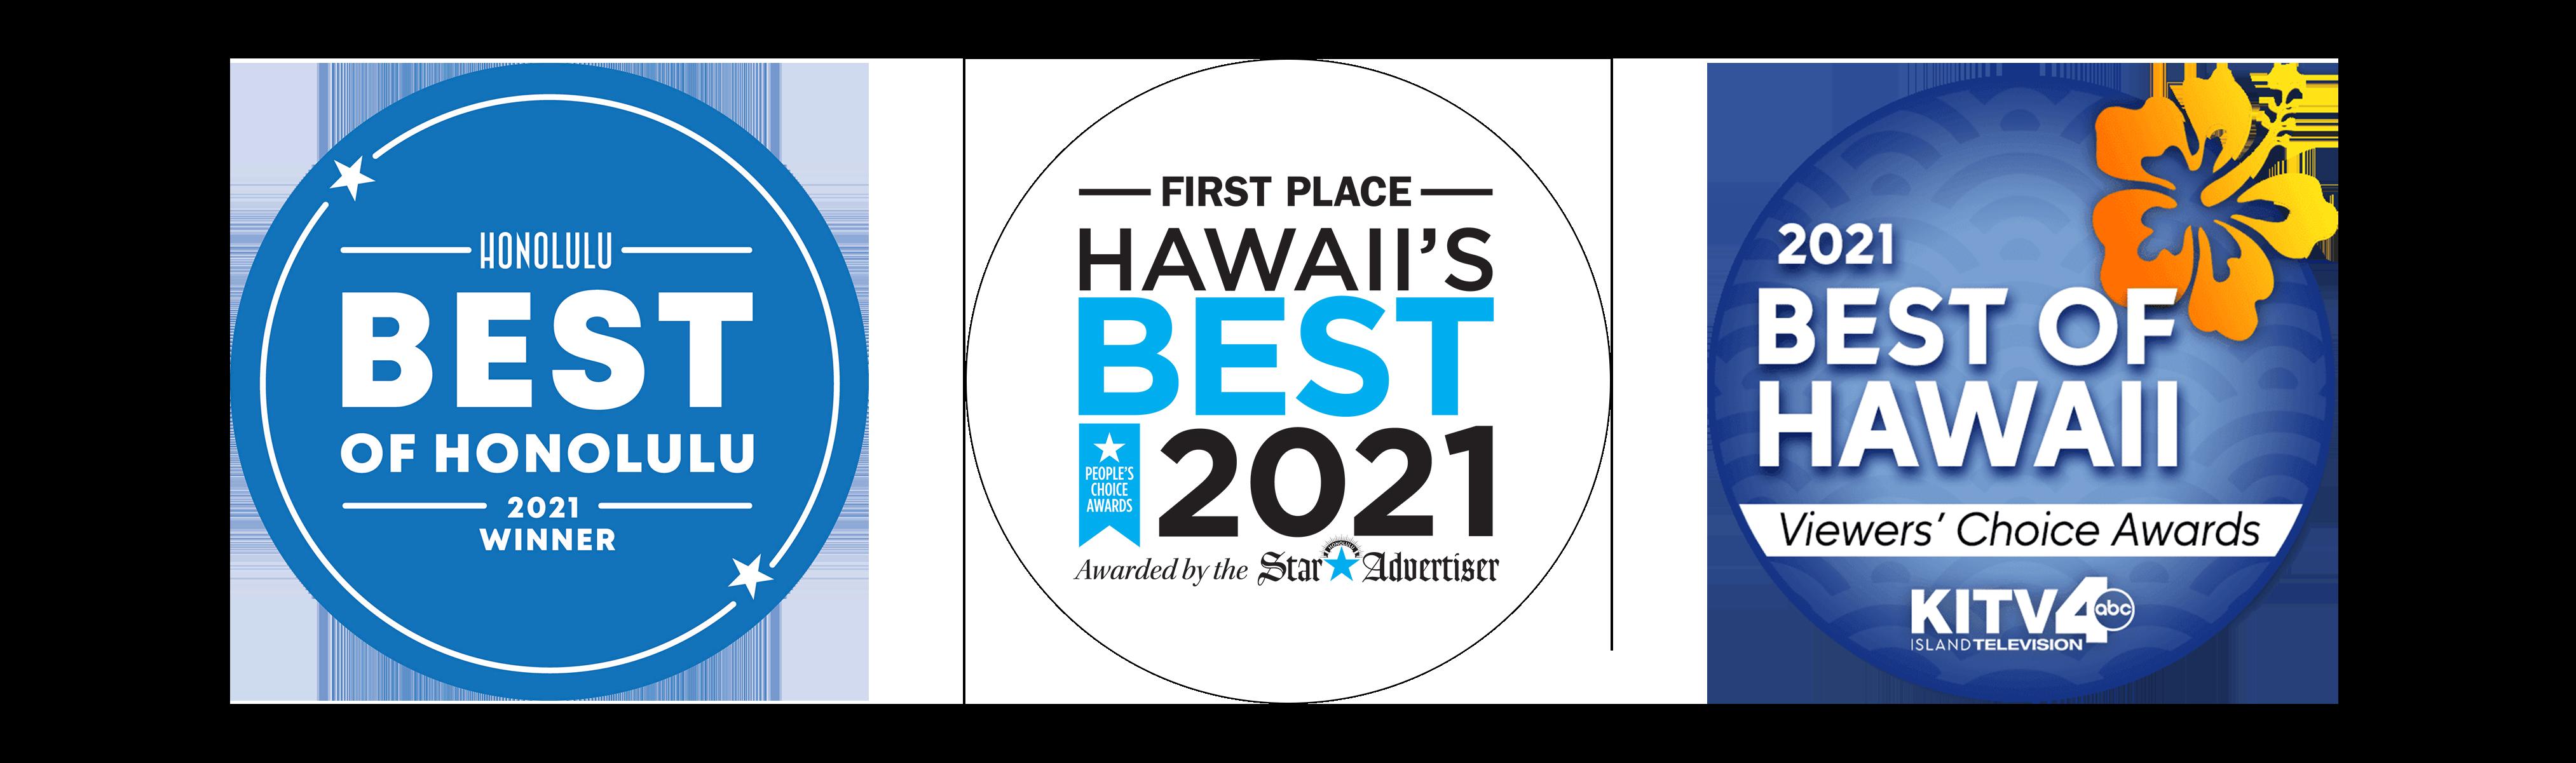 Hawaiis Best